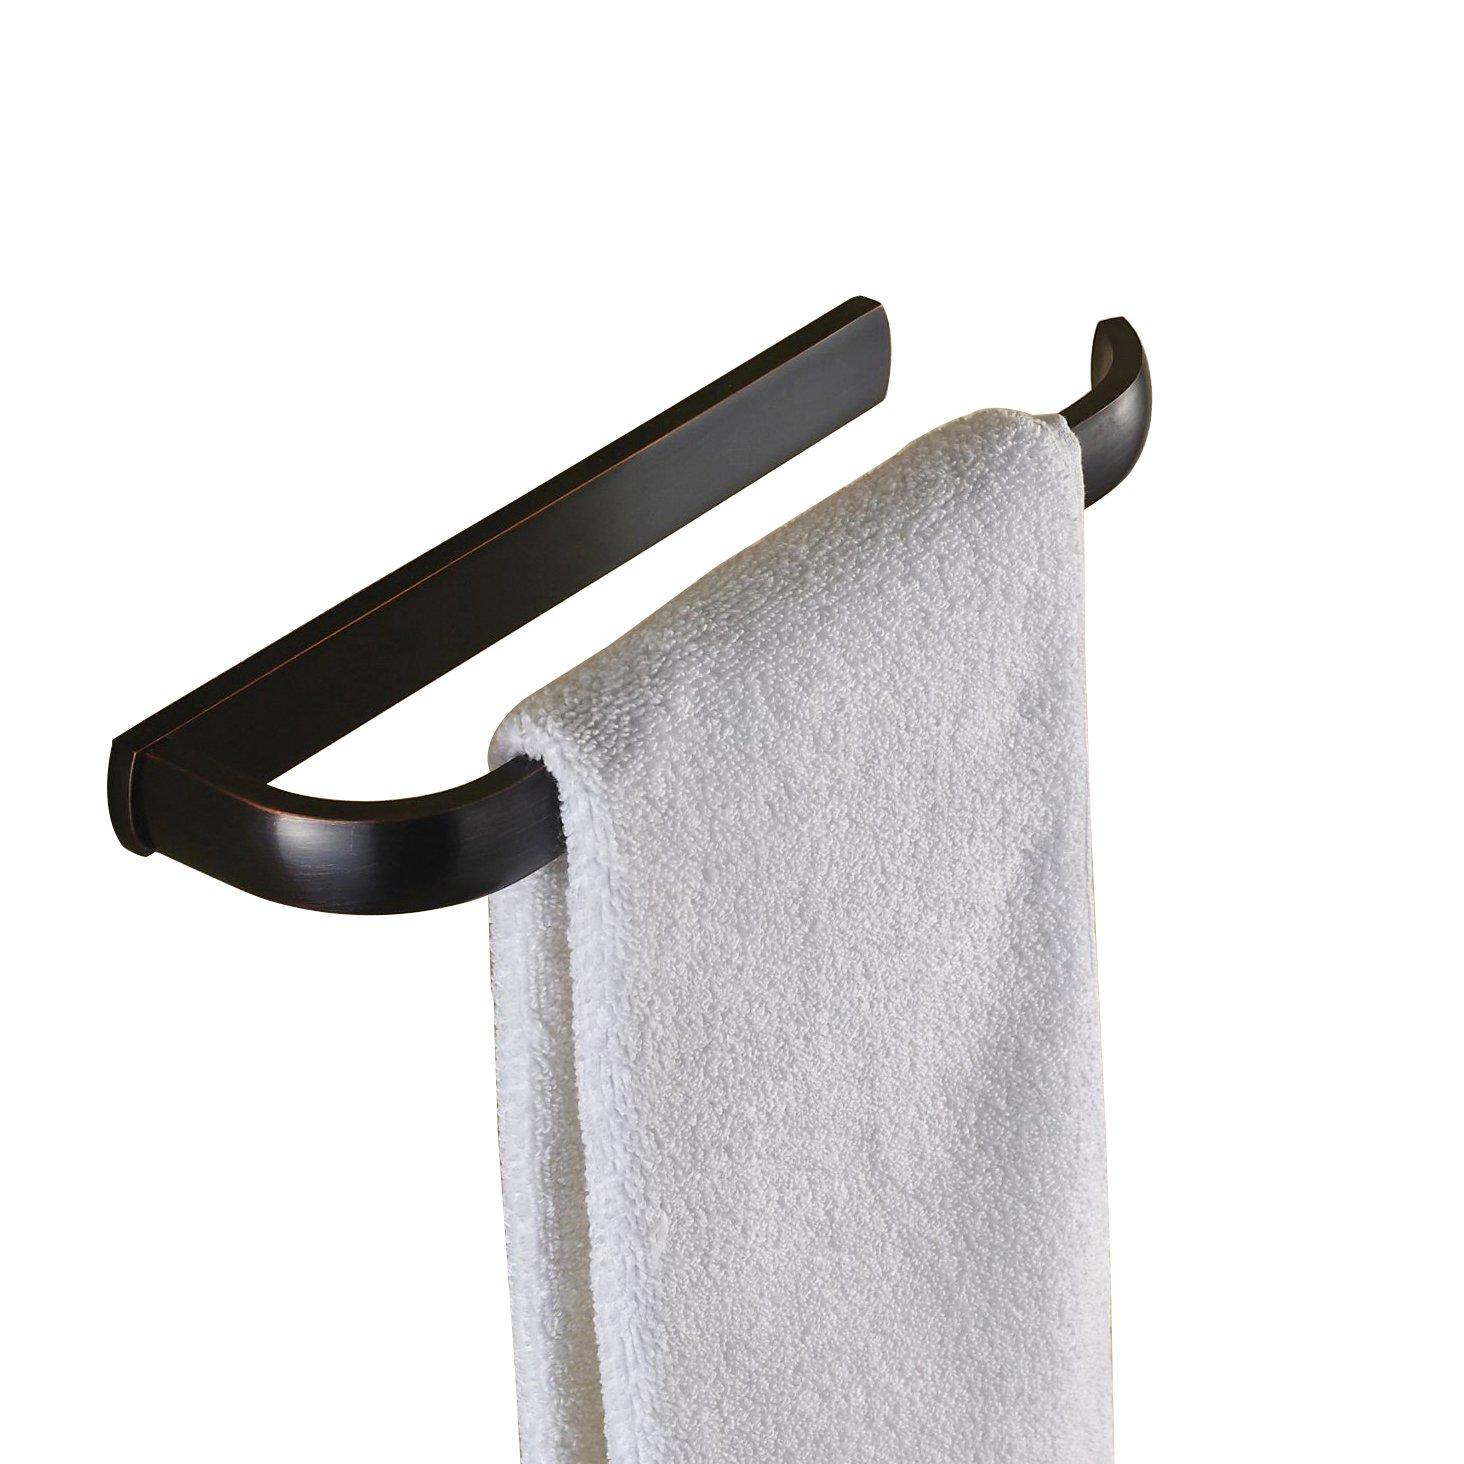 Rozin Bathroom Single Towel Rail Wall Mounted Towel Bar Hanger Black Color